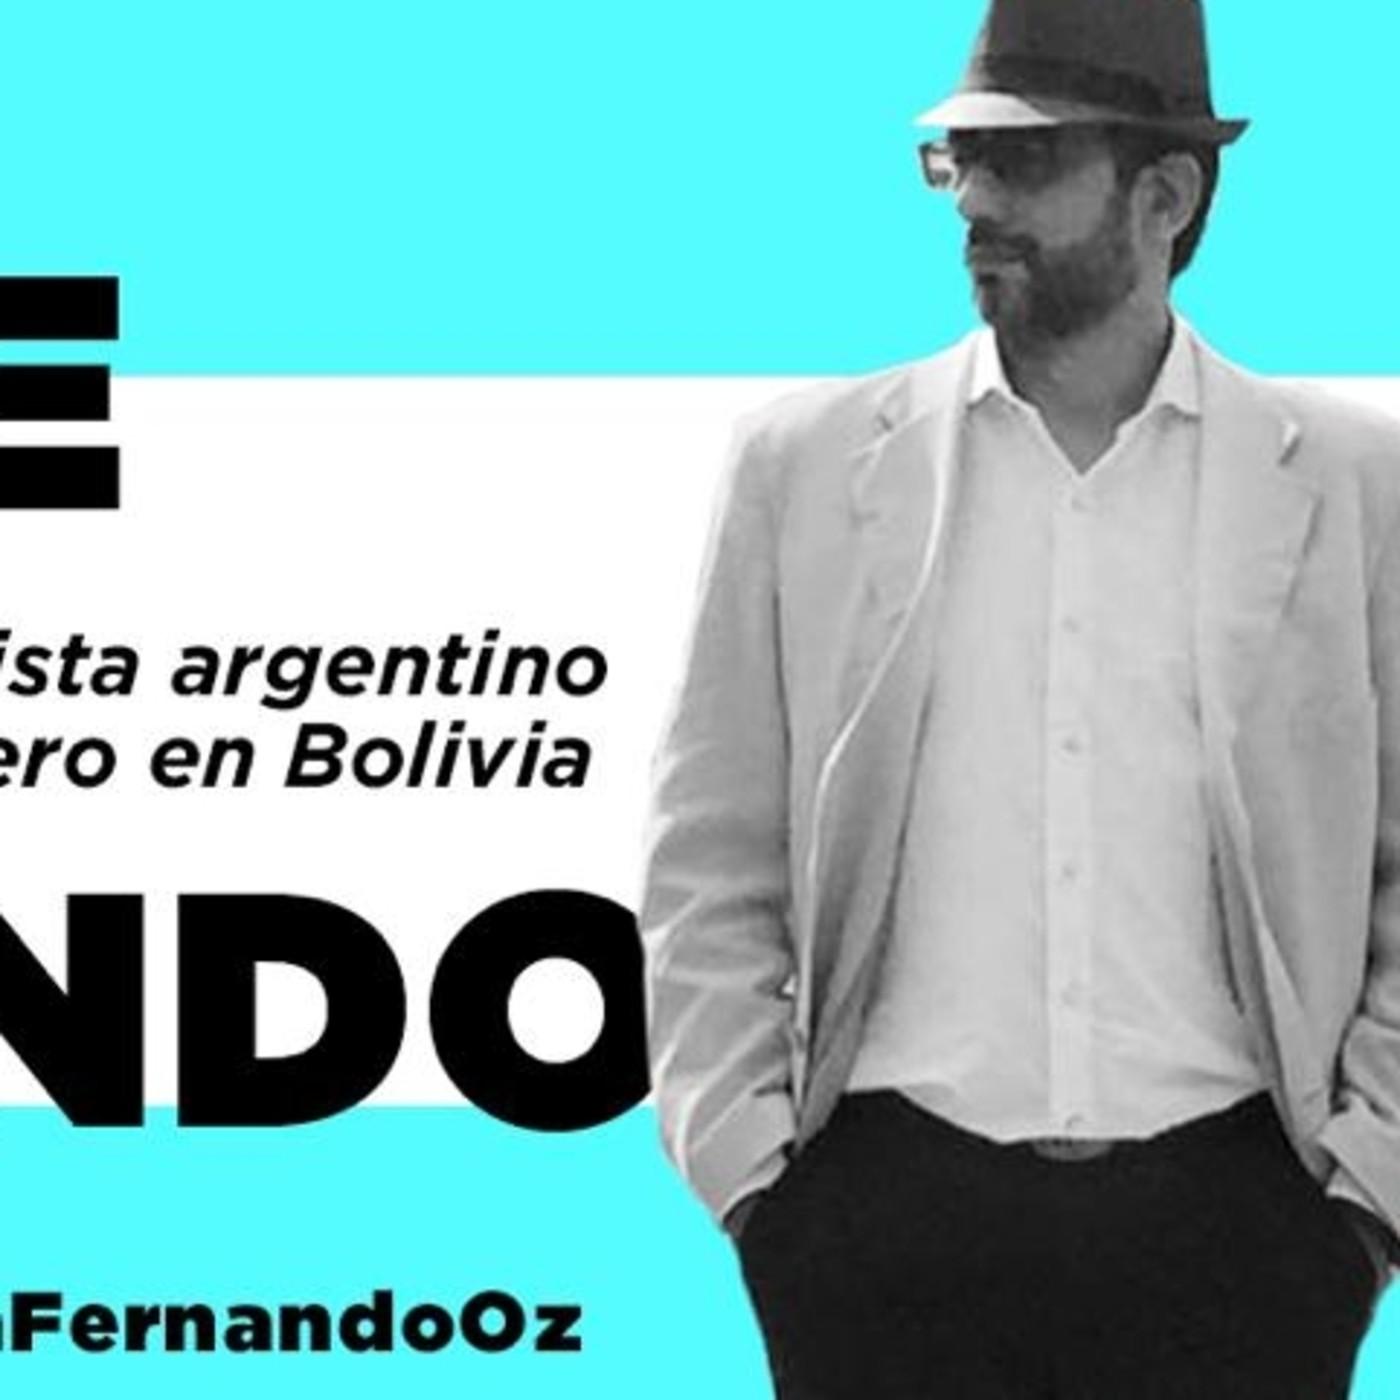 Fernando Oz ,periodista Argentino en Bolivia,Part2